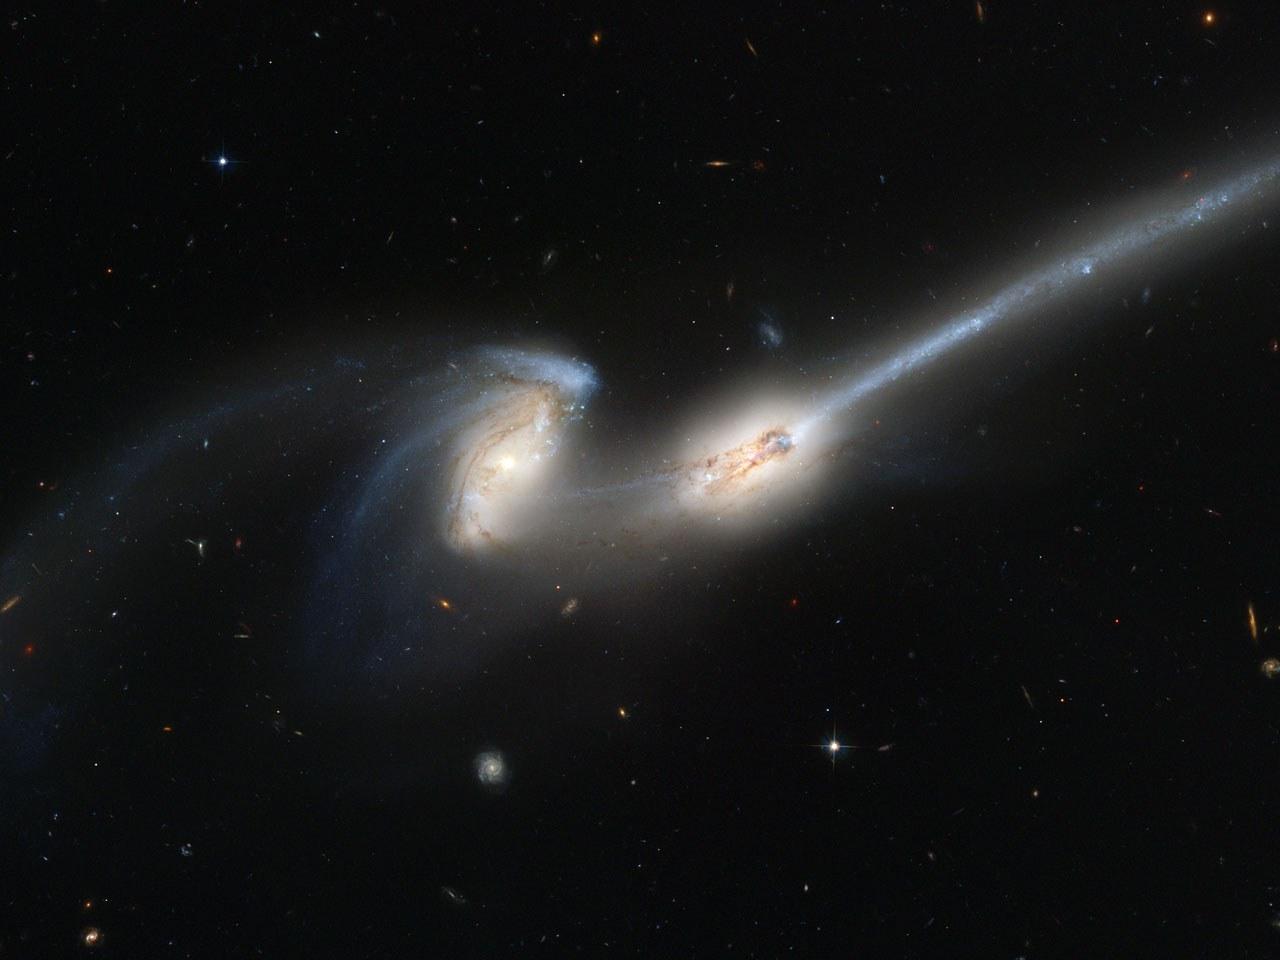 Galaxien auf Kollisionskurs: